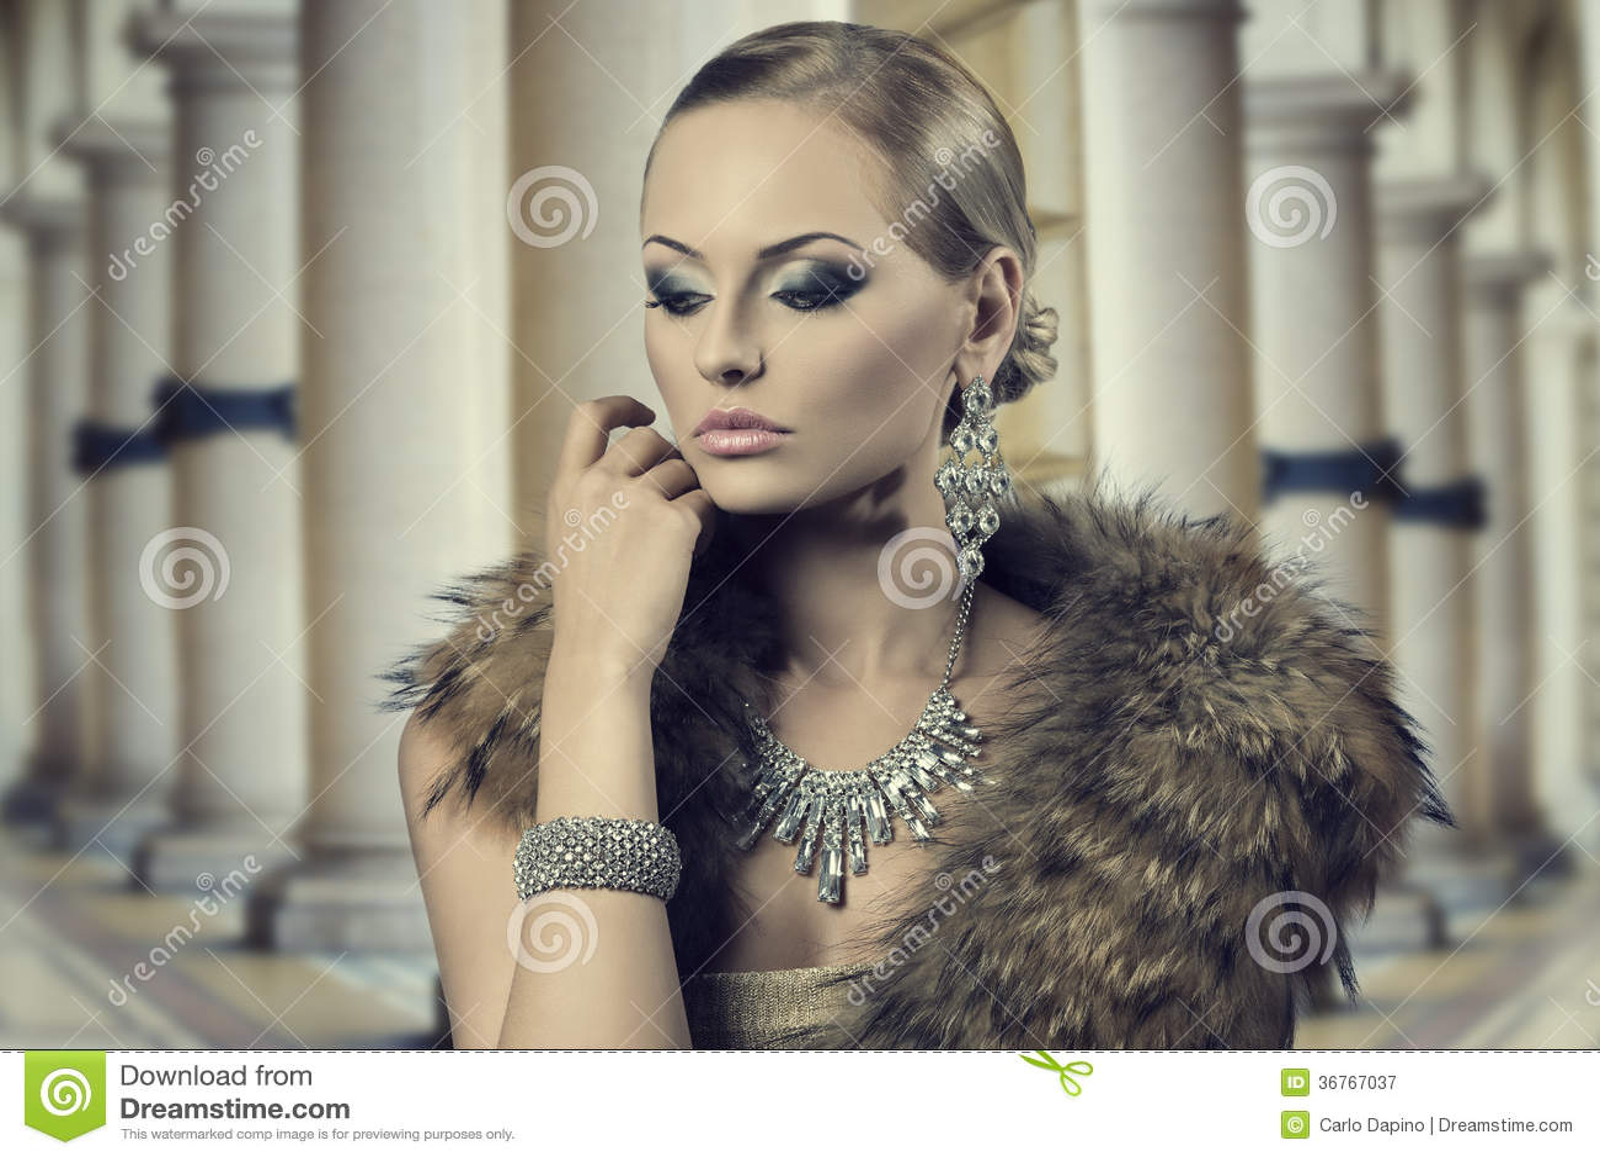 Aristocratic Sensual Fashion Woman Royalty Free Stock Photography Image 36767037